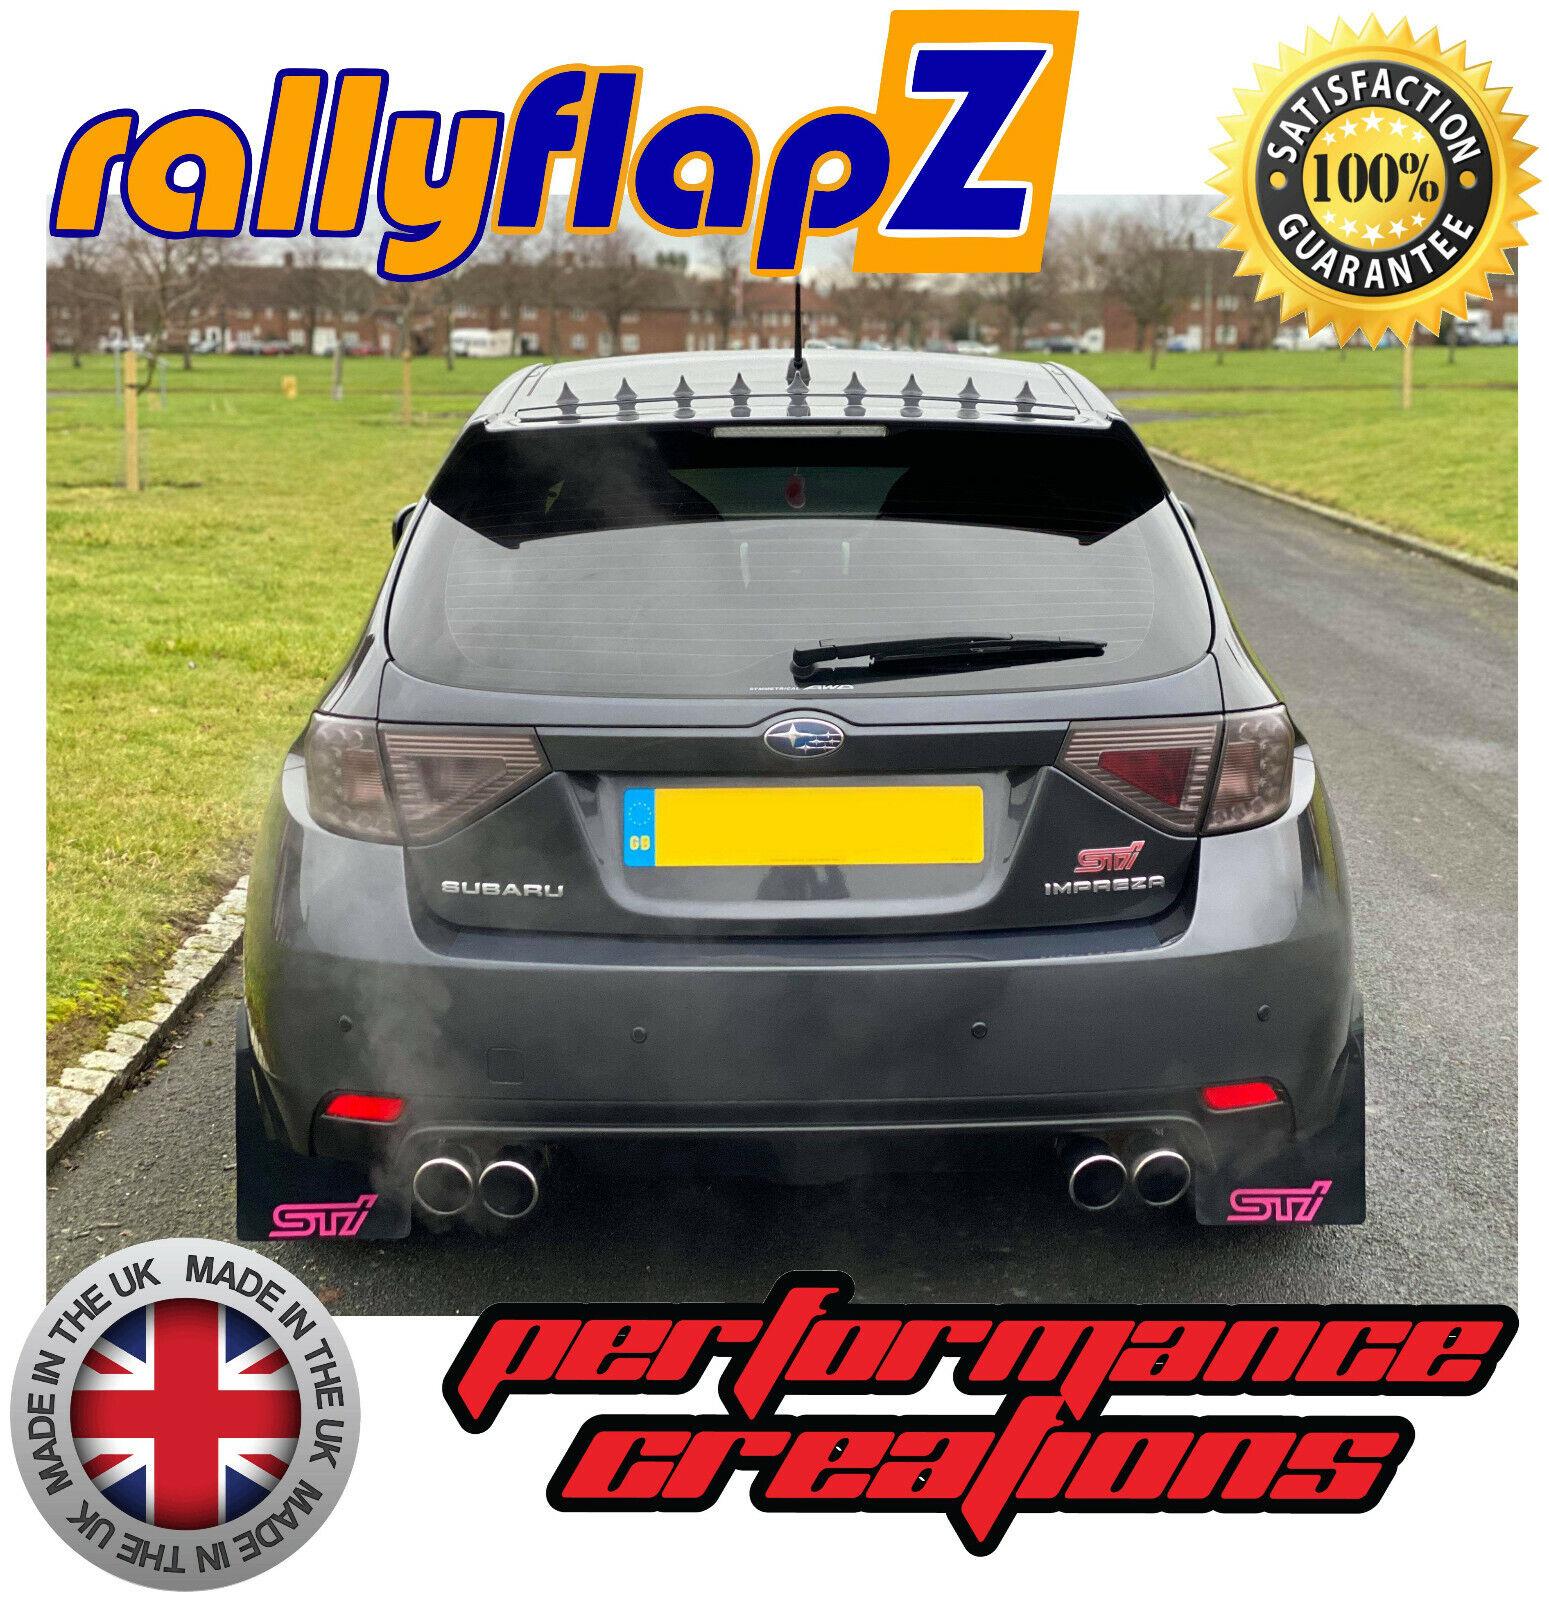 Mudflaps SUBARU IMPREZA Sedán 10-14 RallyflapZ 4 mm PVC Negro Rosa Sti estilo SML